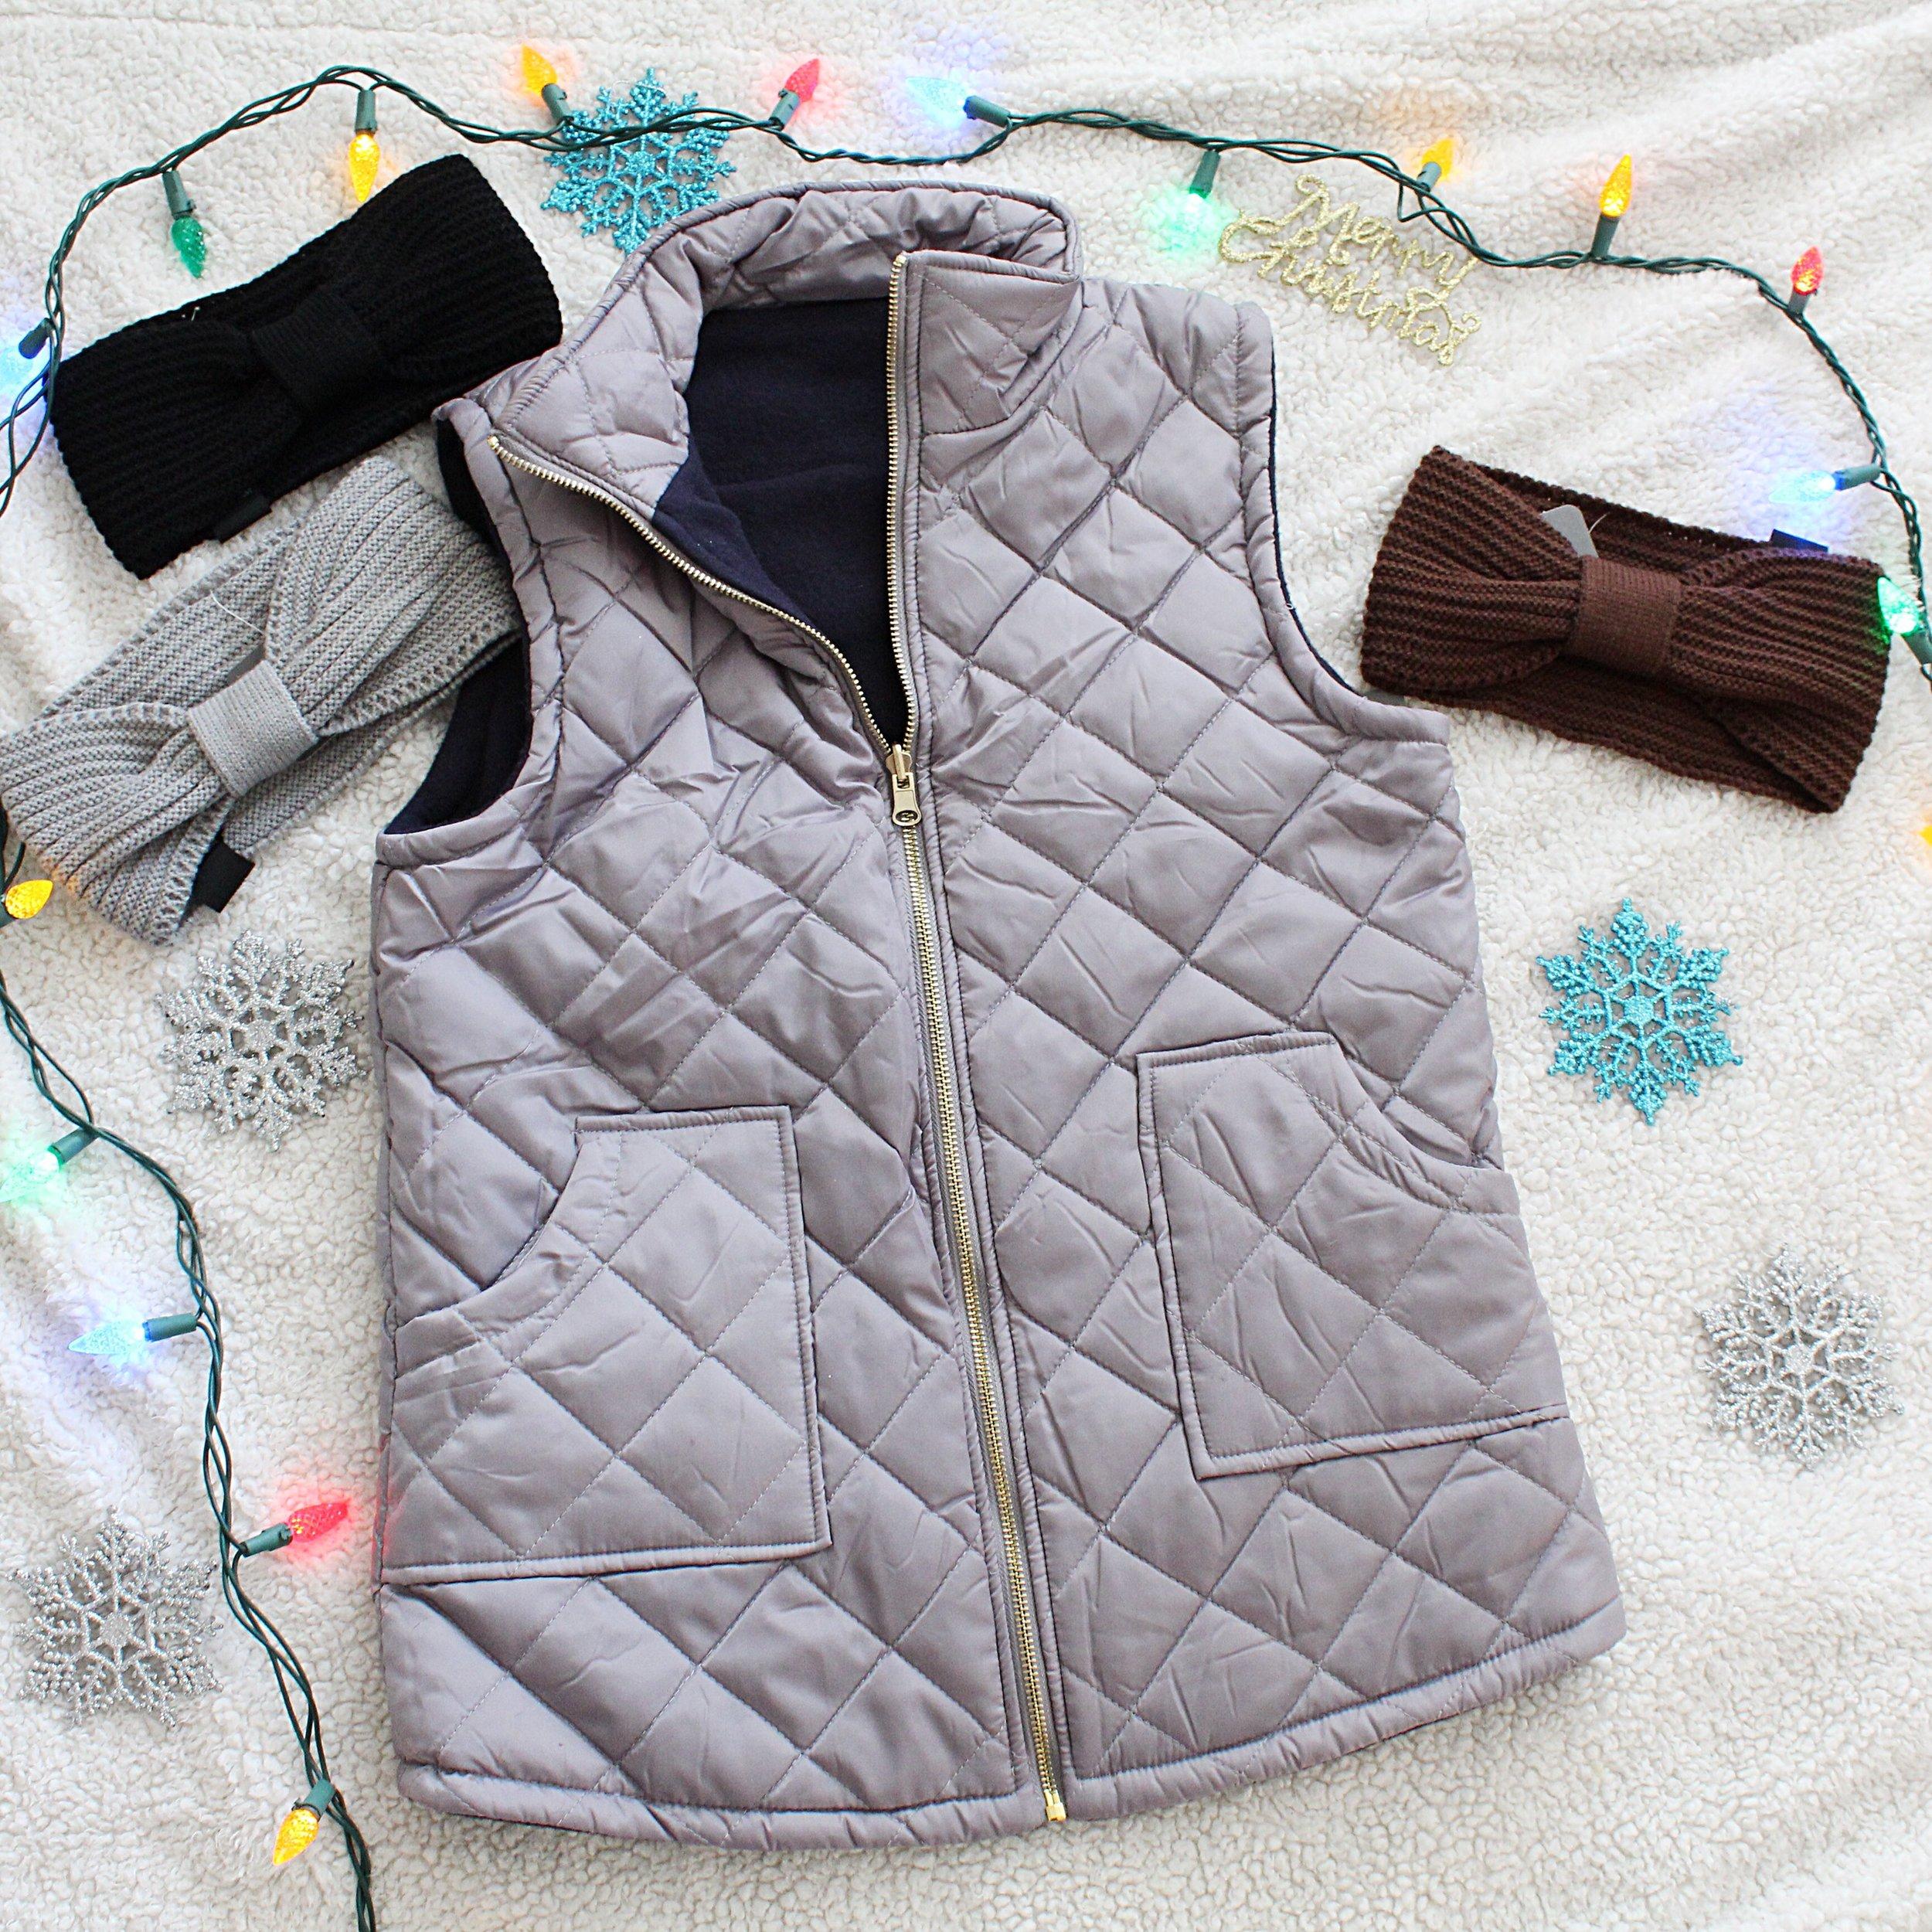 Bella Magari Winter Outfit